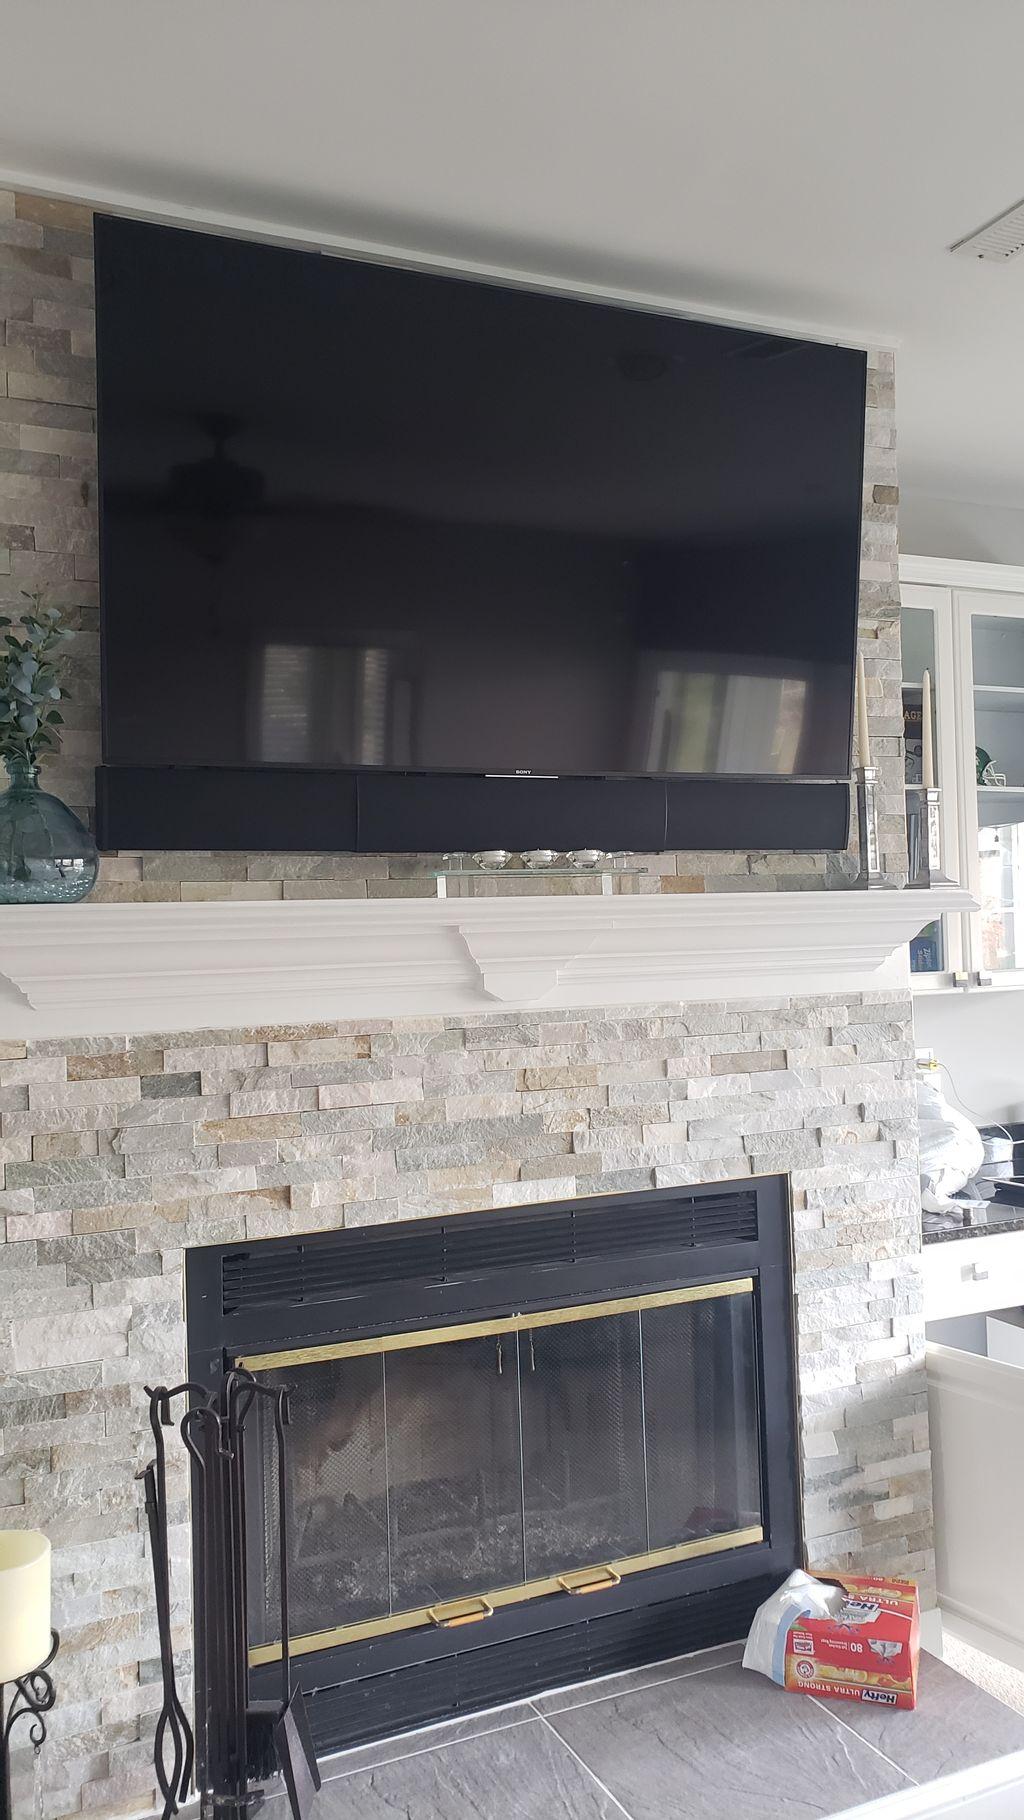 Sony TV and Adjustable Sonance Sounbar  Over custom fireplace